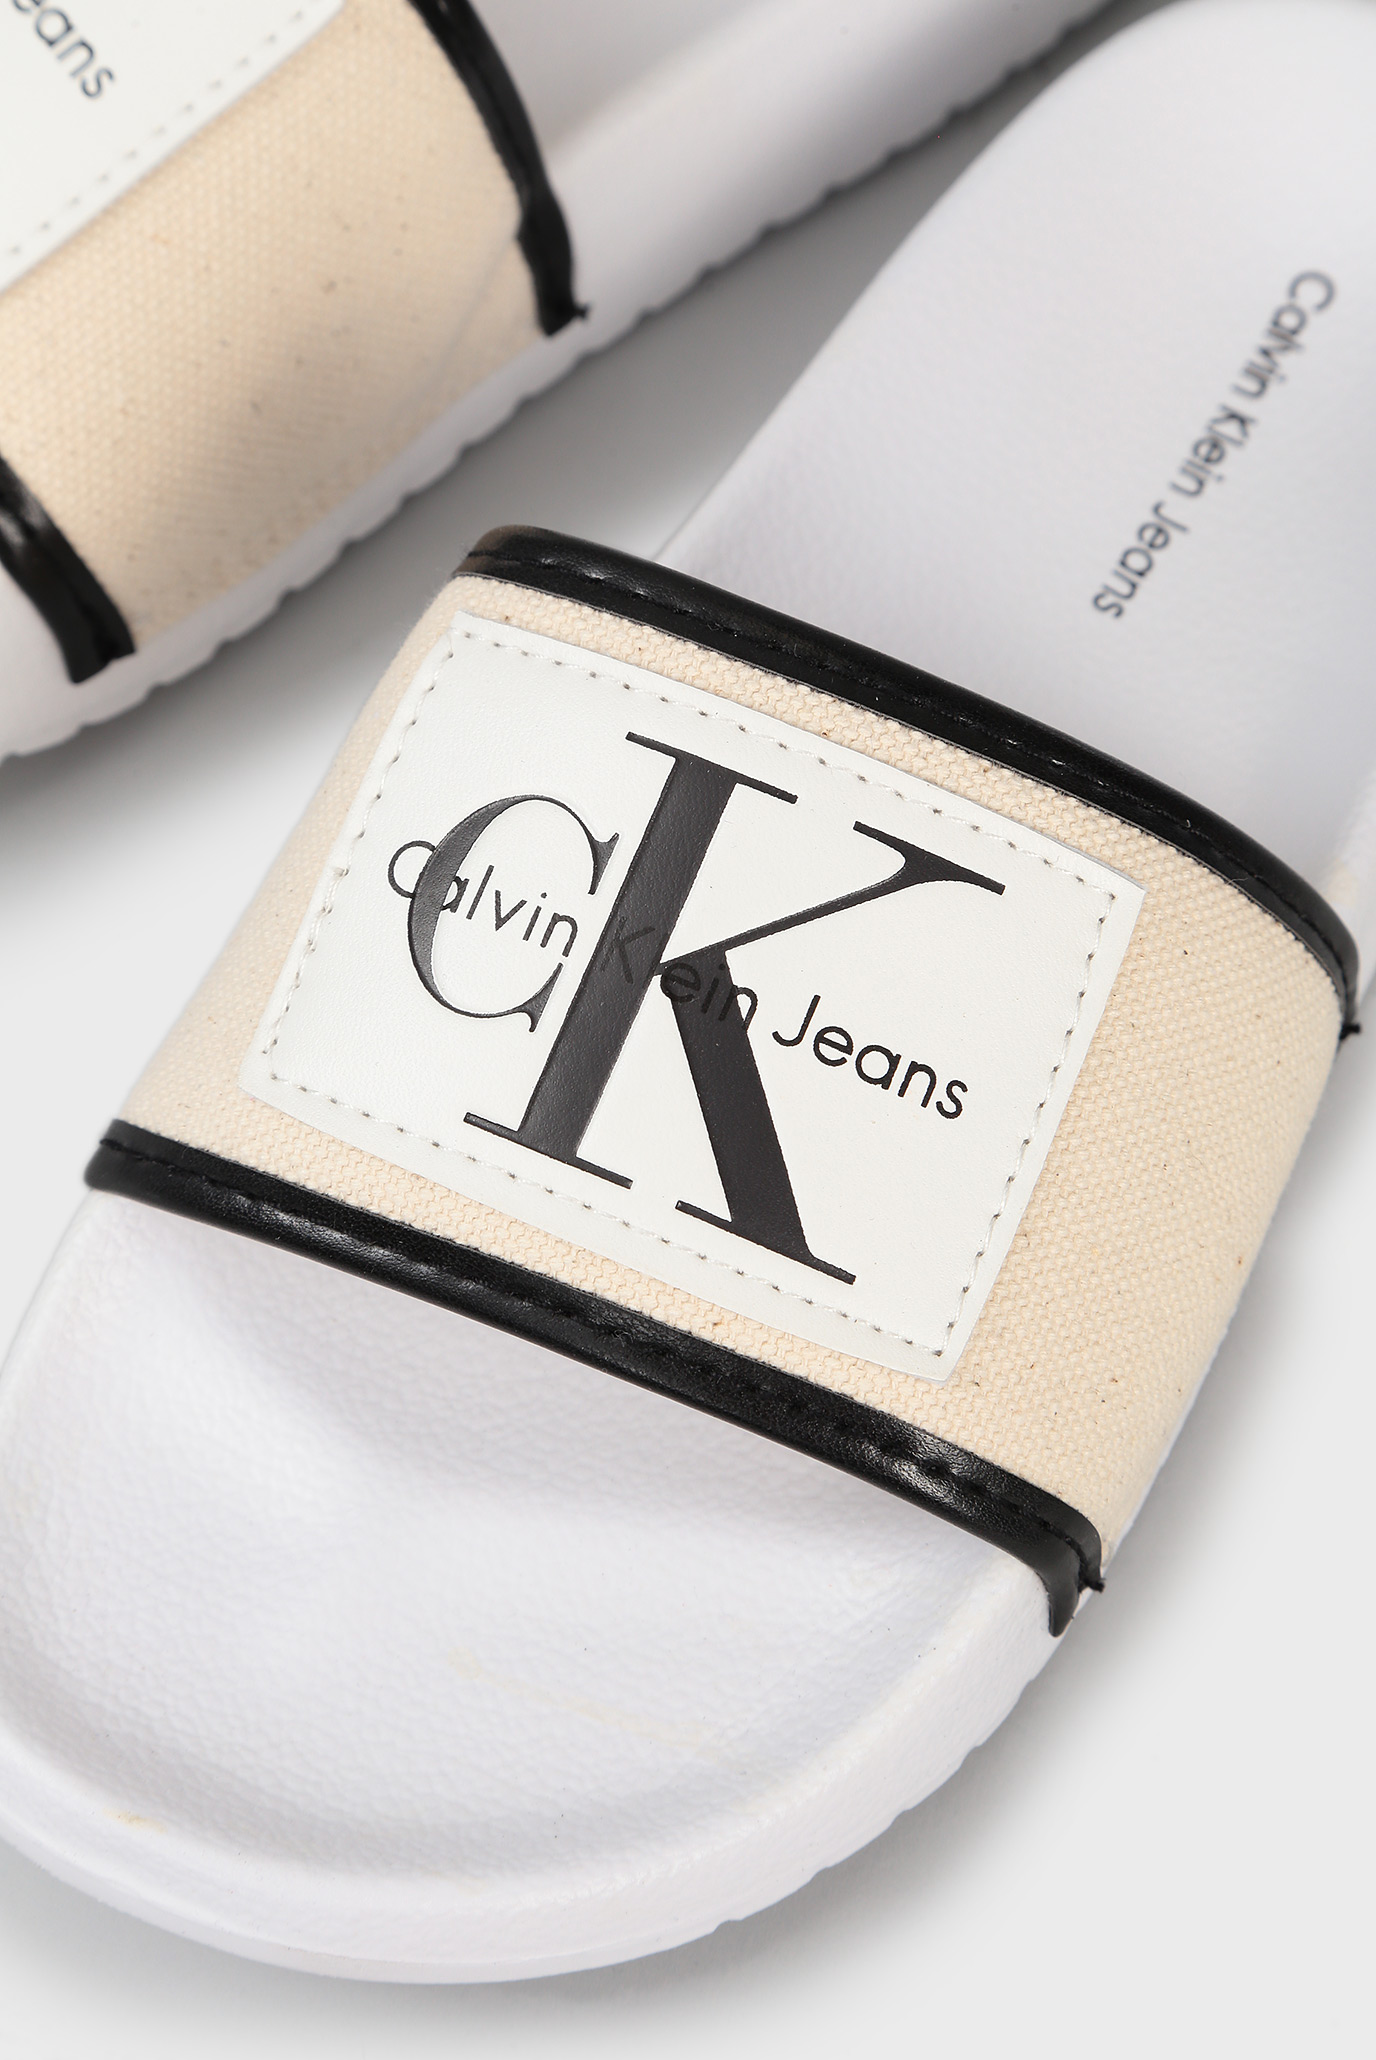 Купить Женские бежевые слайдеры Calvin Klein Calvin Klein R8806 – Киев, Украина. Цены в интернет магазине MD Fashion